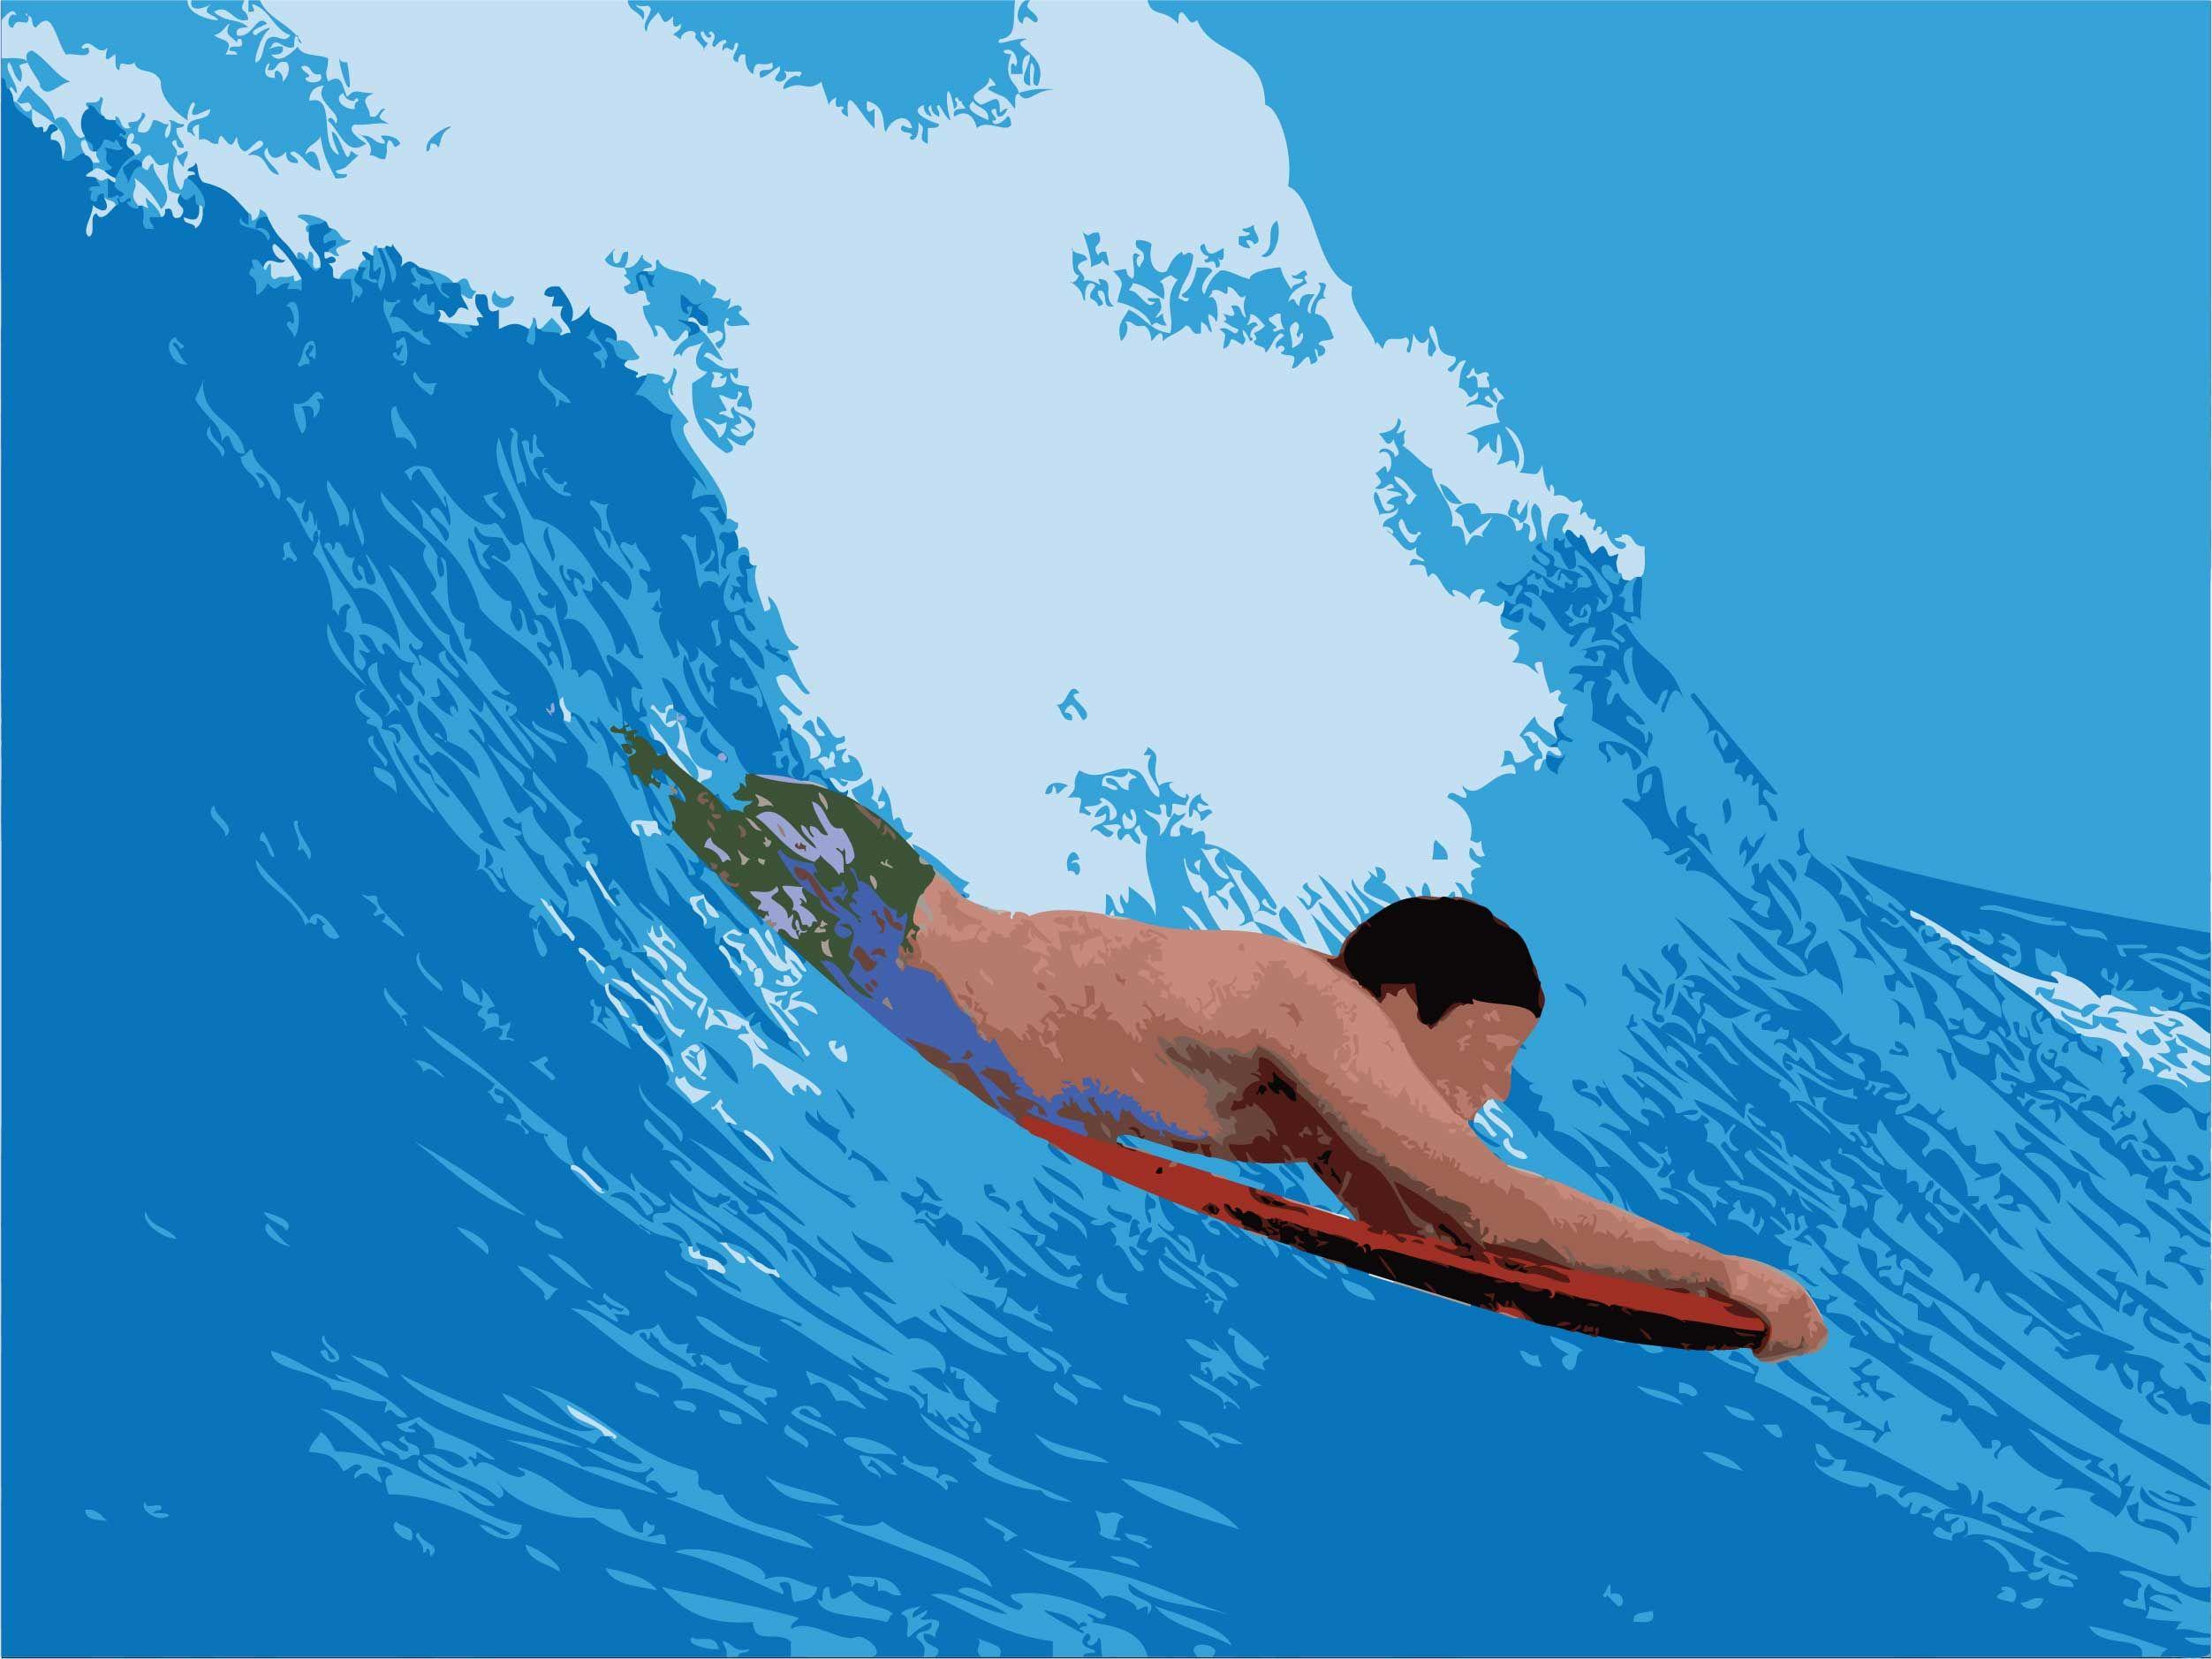 How To Boogie Board Boogie Boards Bodyboarding Surfing